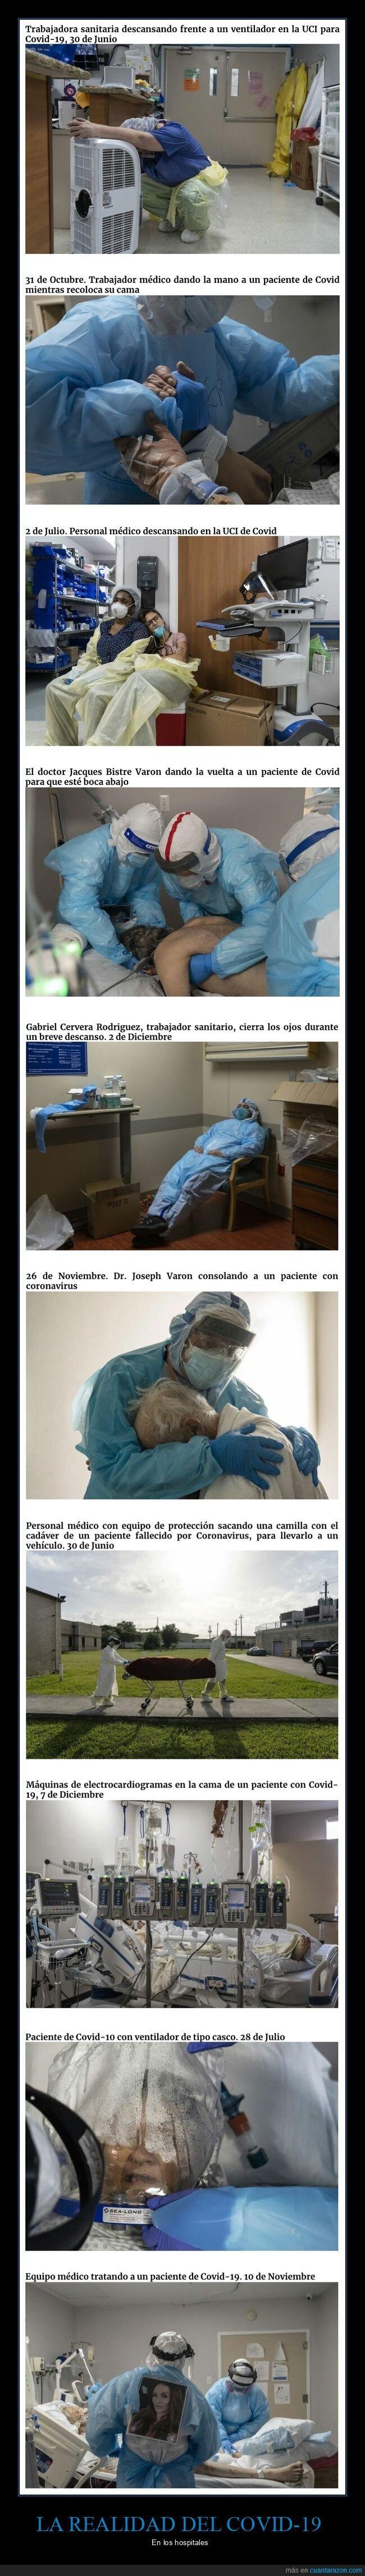 coronavirus,hospitales,sanitarios